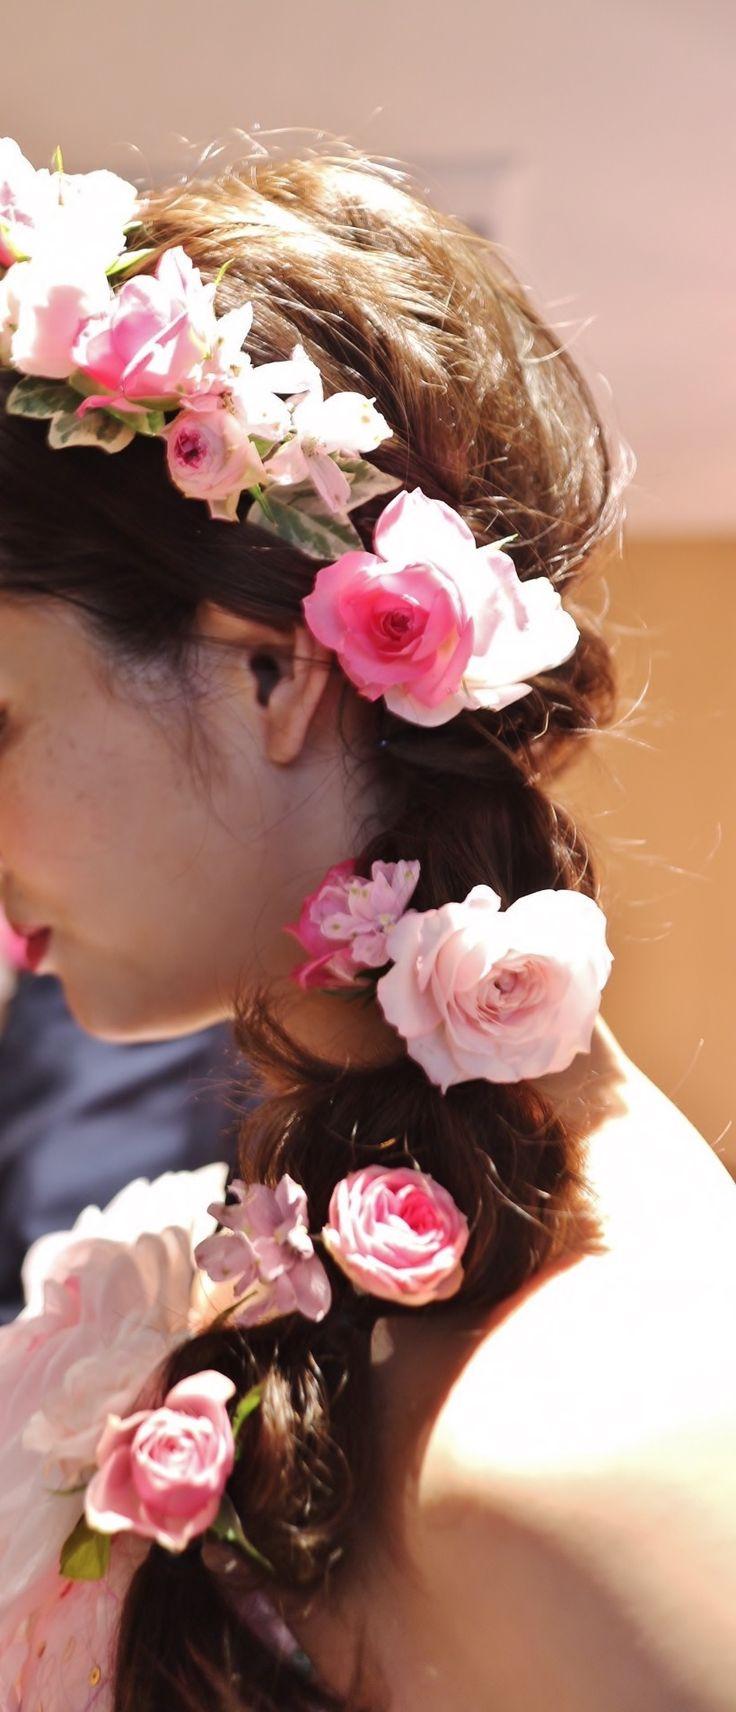 #koriyamamonolithi#novarese#vressetrose#wedding #pink #smokypink #natural #flower #bridal#郡山モノリス#ノバレーゼ#ブレスエットロゼ #ウエディング# ピンク #スモーキーピンク #シンプル #ナチュラル# ブライダル#結婚式#ヘア